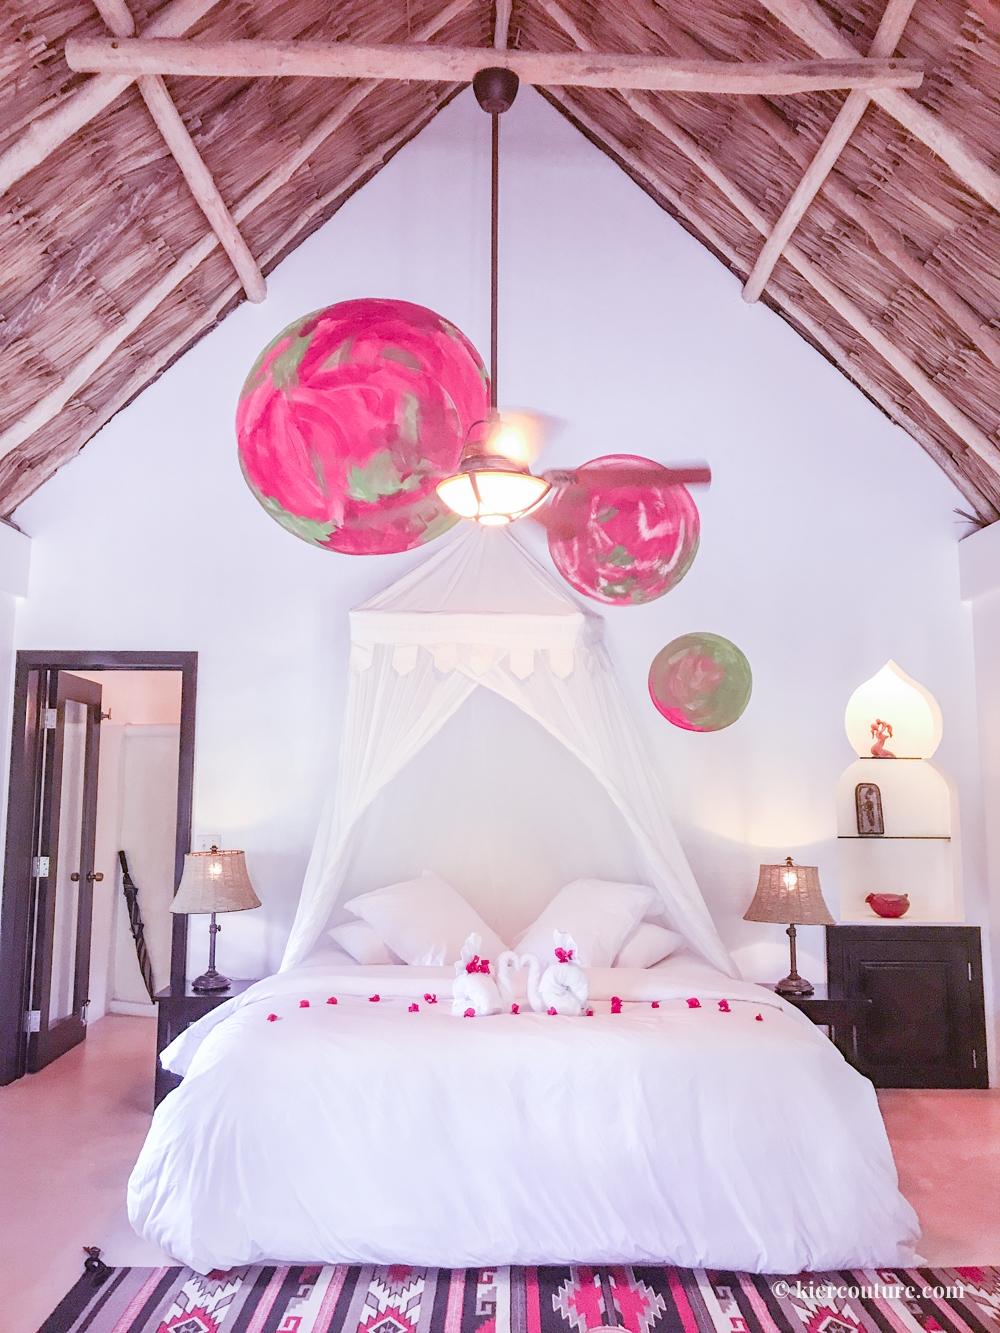 Matachica Resort Belize interior room